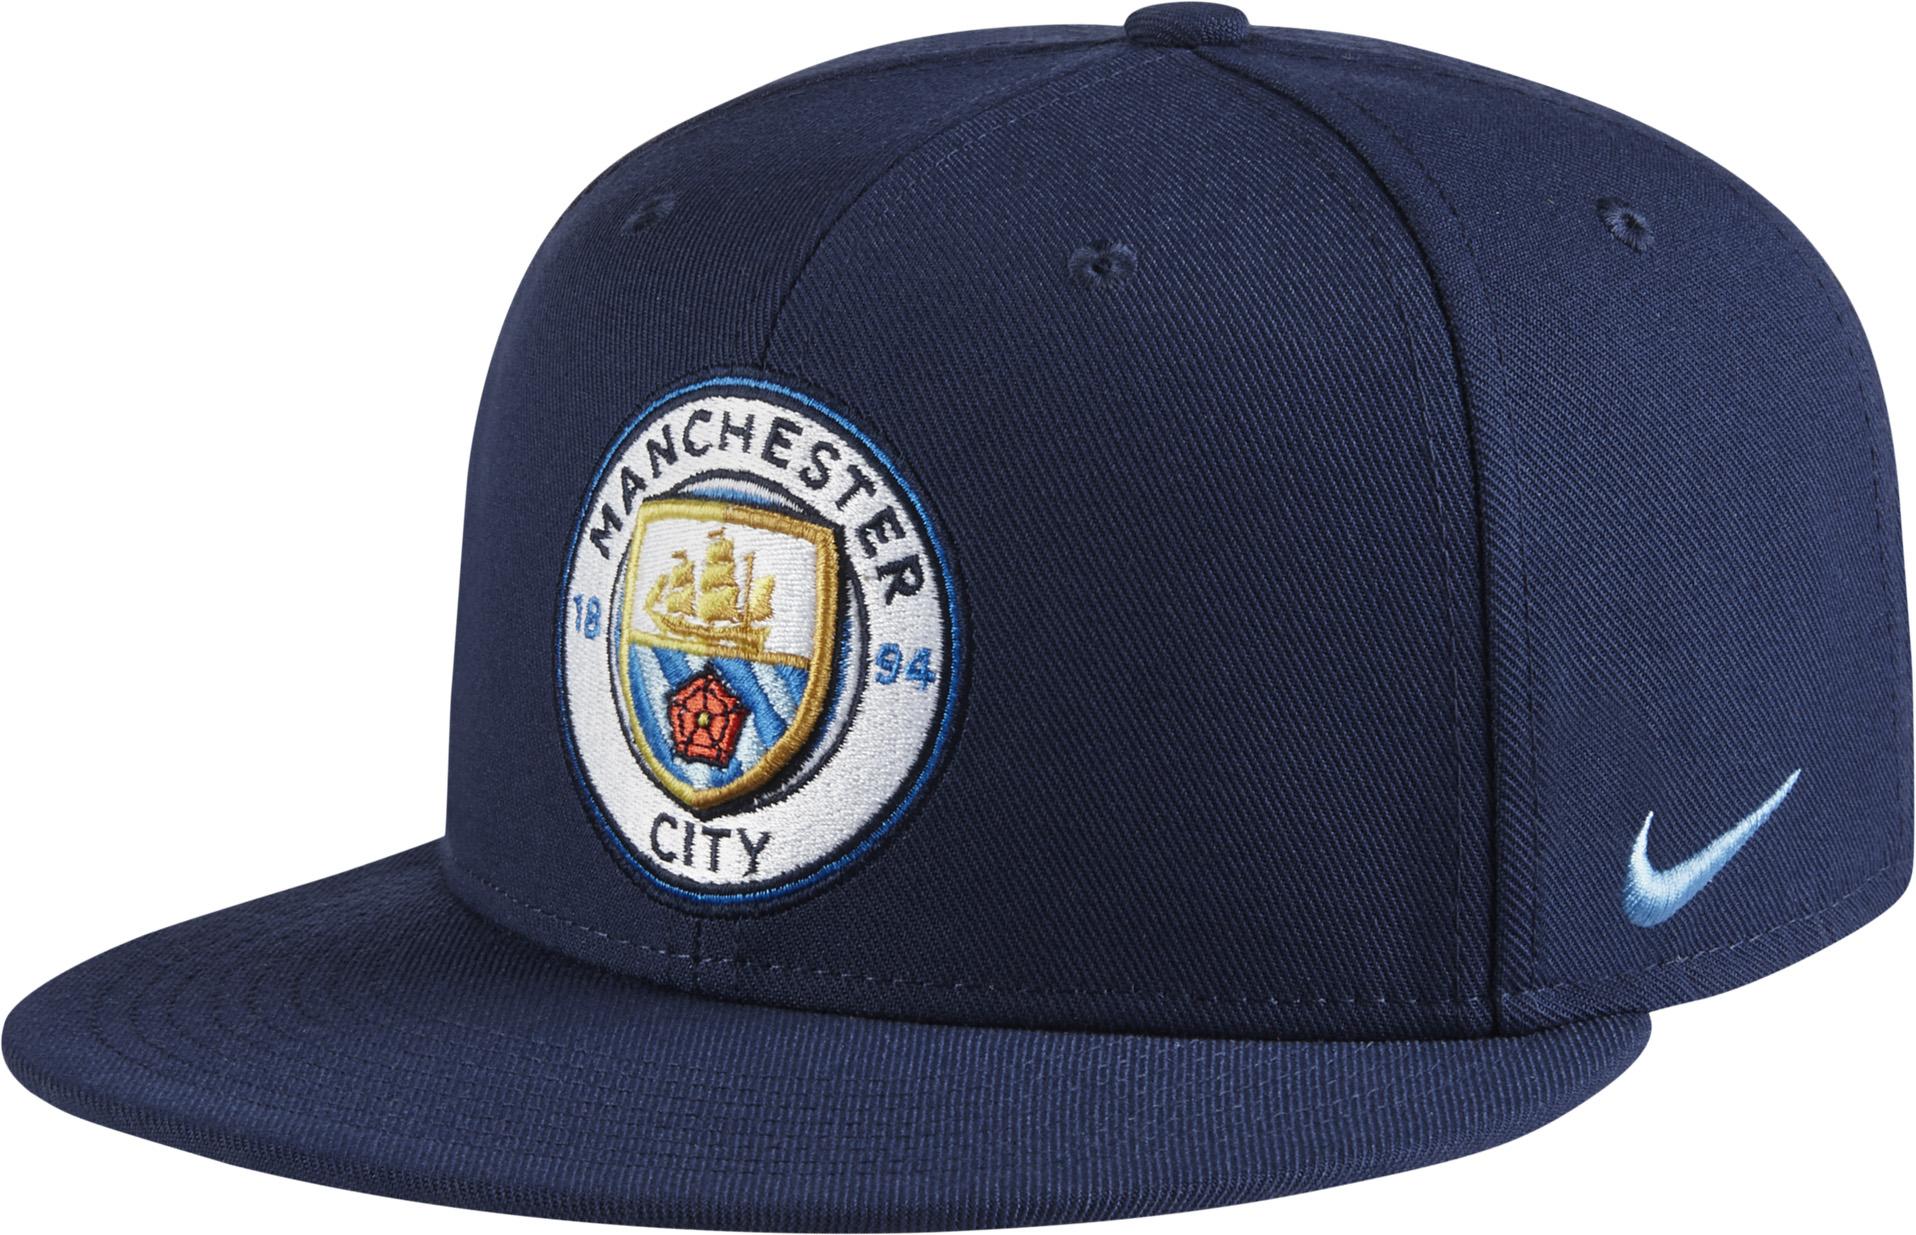 54e26956993 Nike Manchester City True Hat - Midnight Navy   Field Blue - Soccer ...